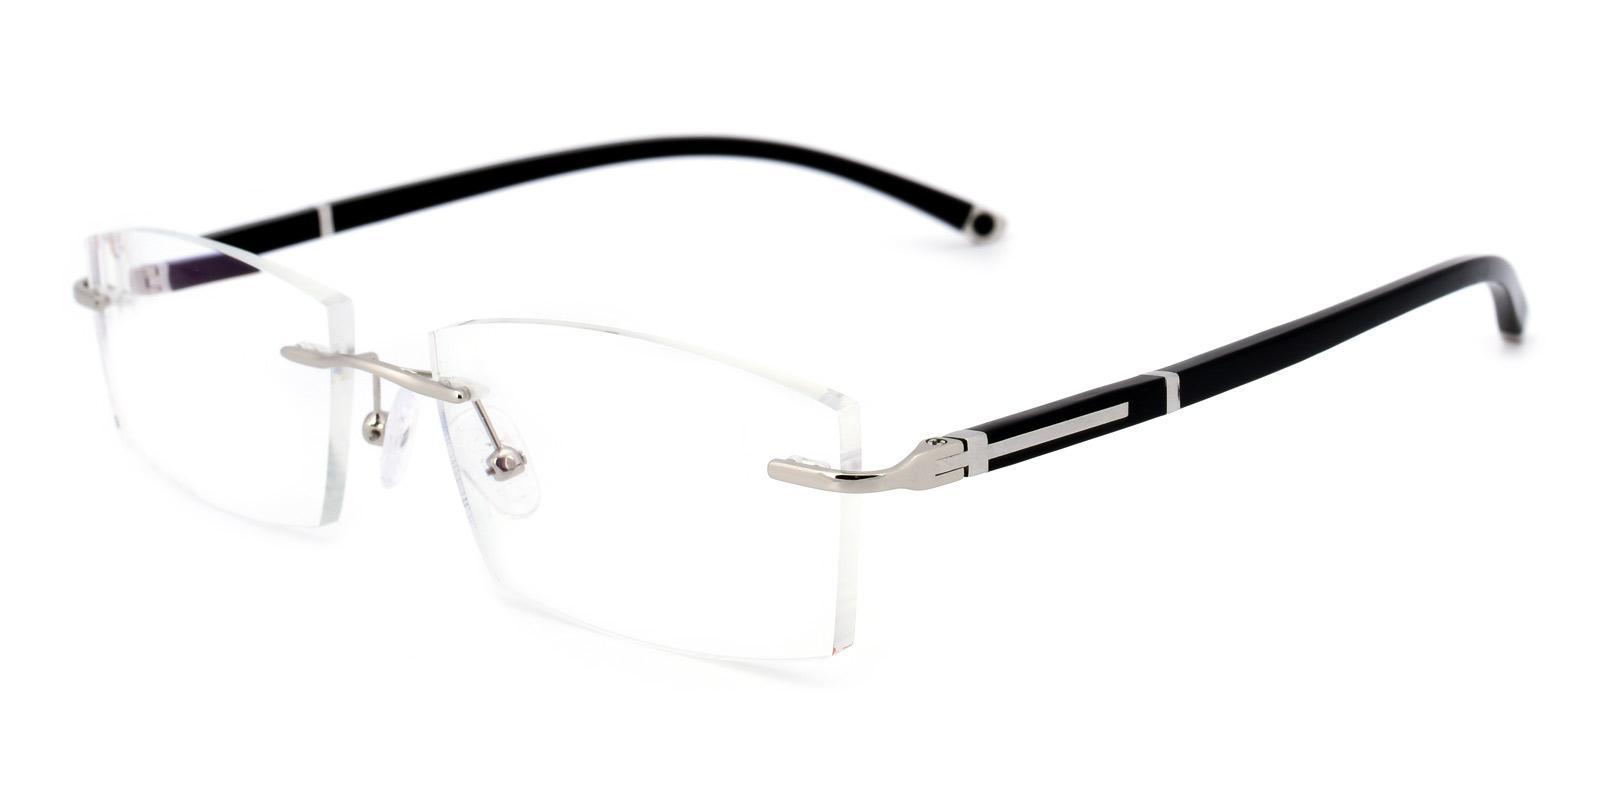 Doumbia-Silver-Varieties-Titanium-Eyeglasses-additional1